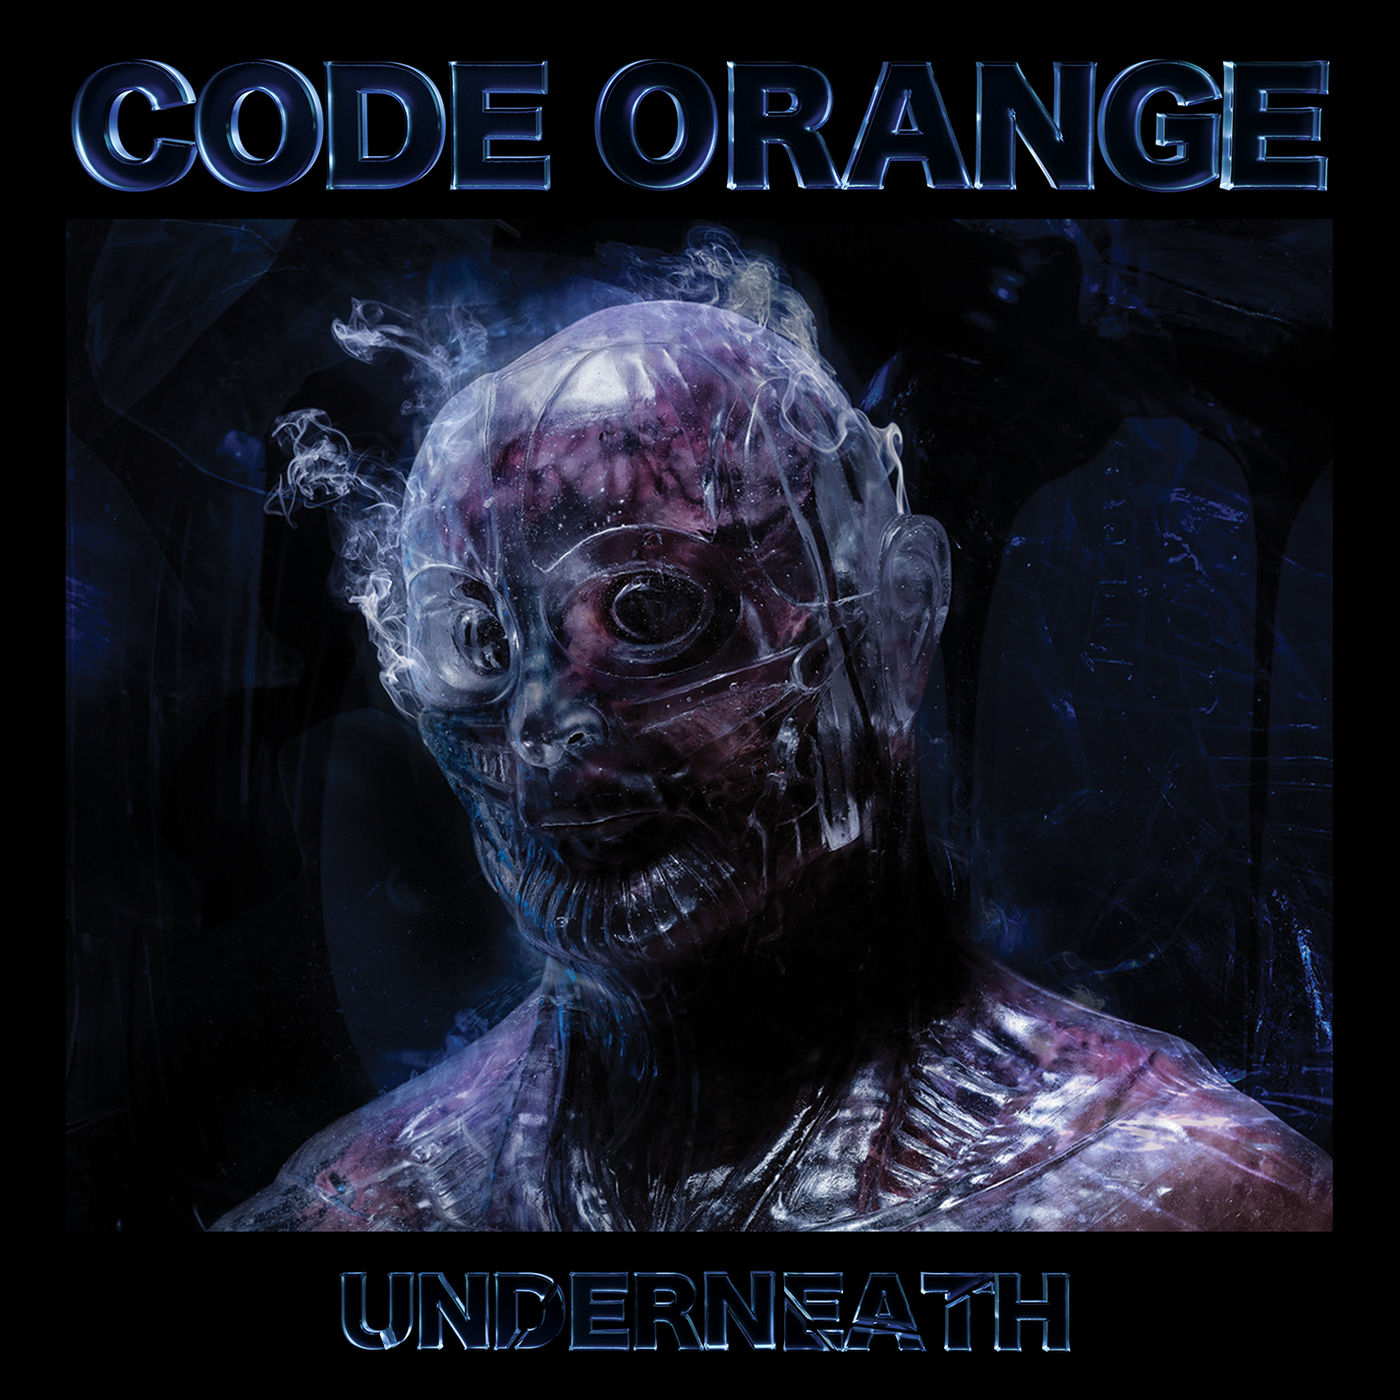 Code Orange - Sulfur Surrounding [single] (2020)